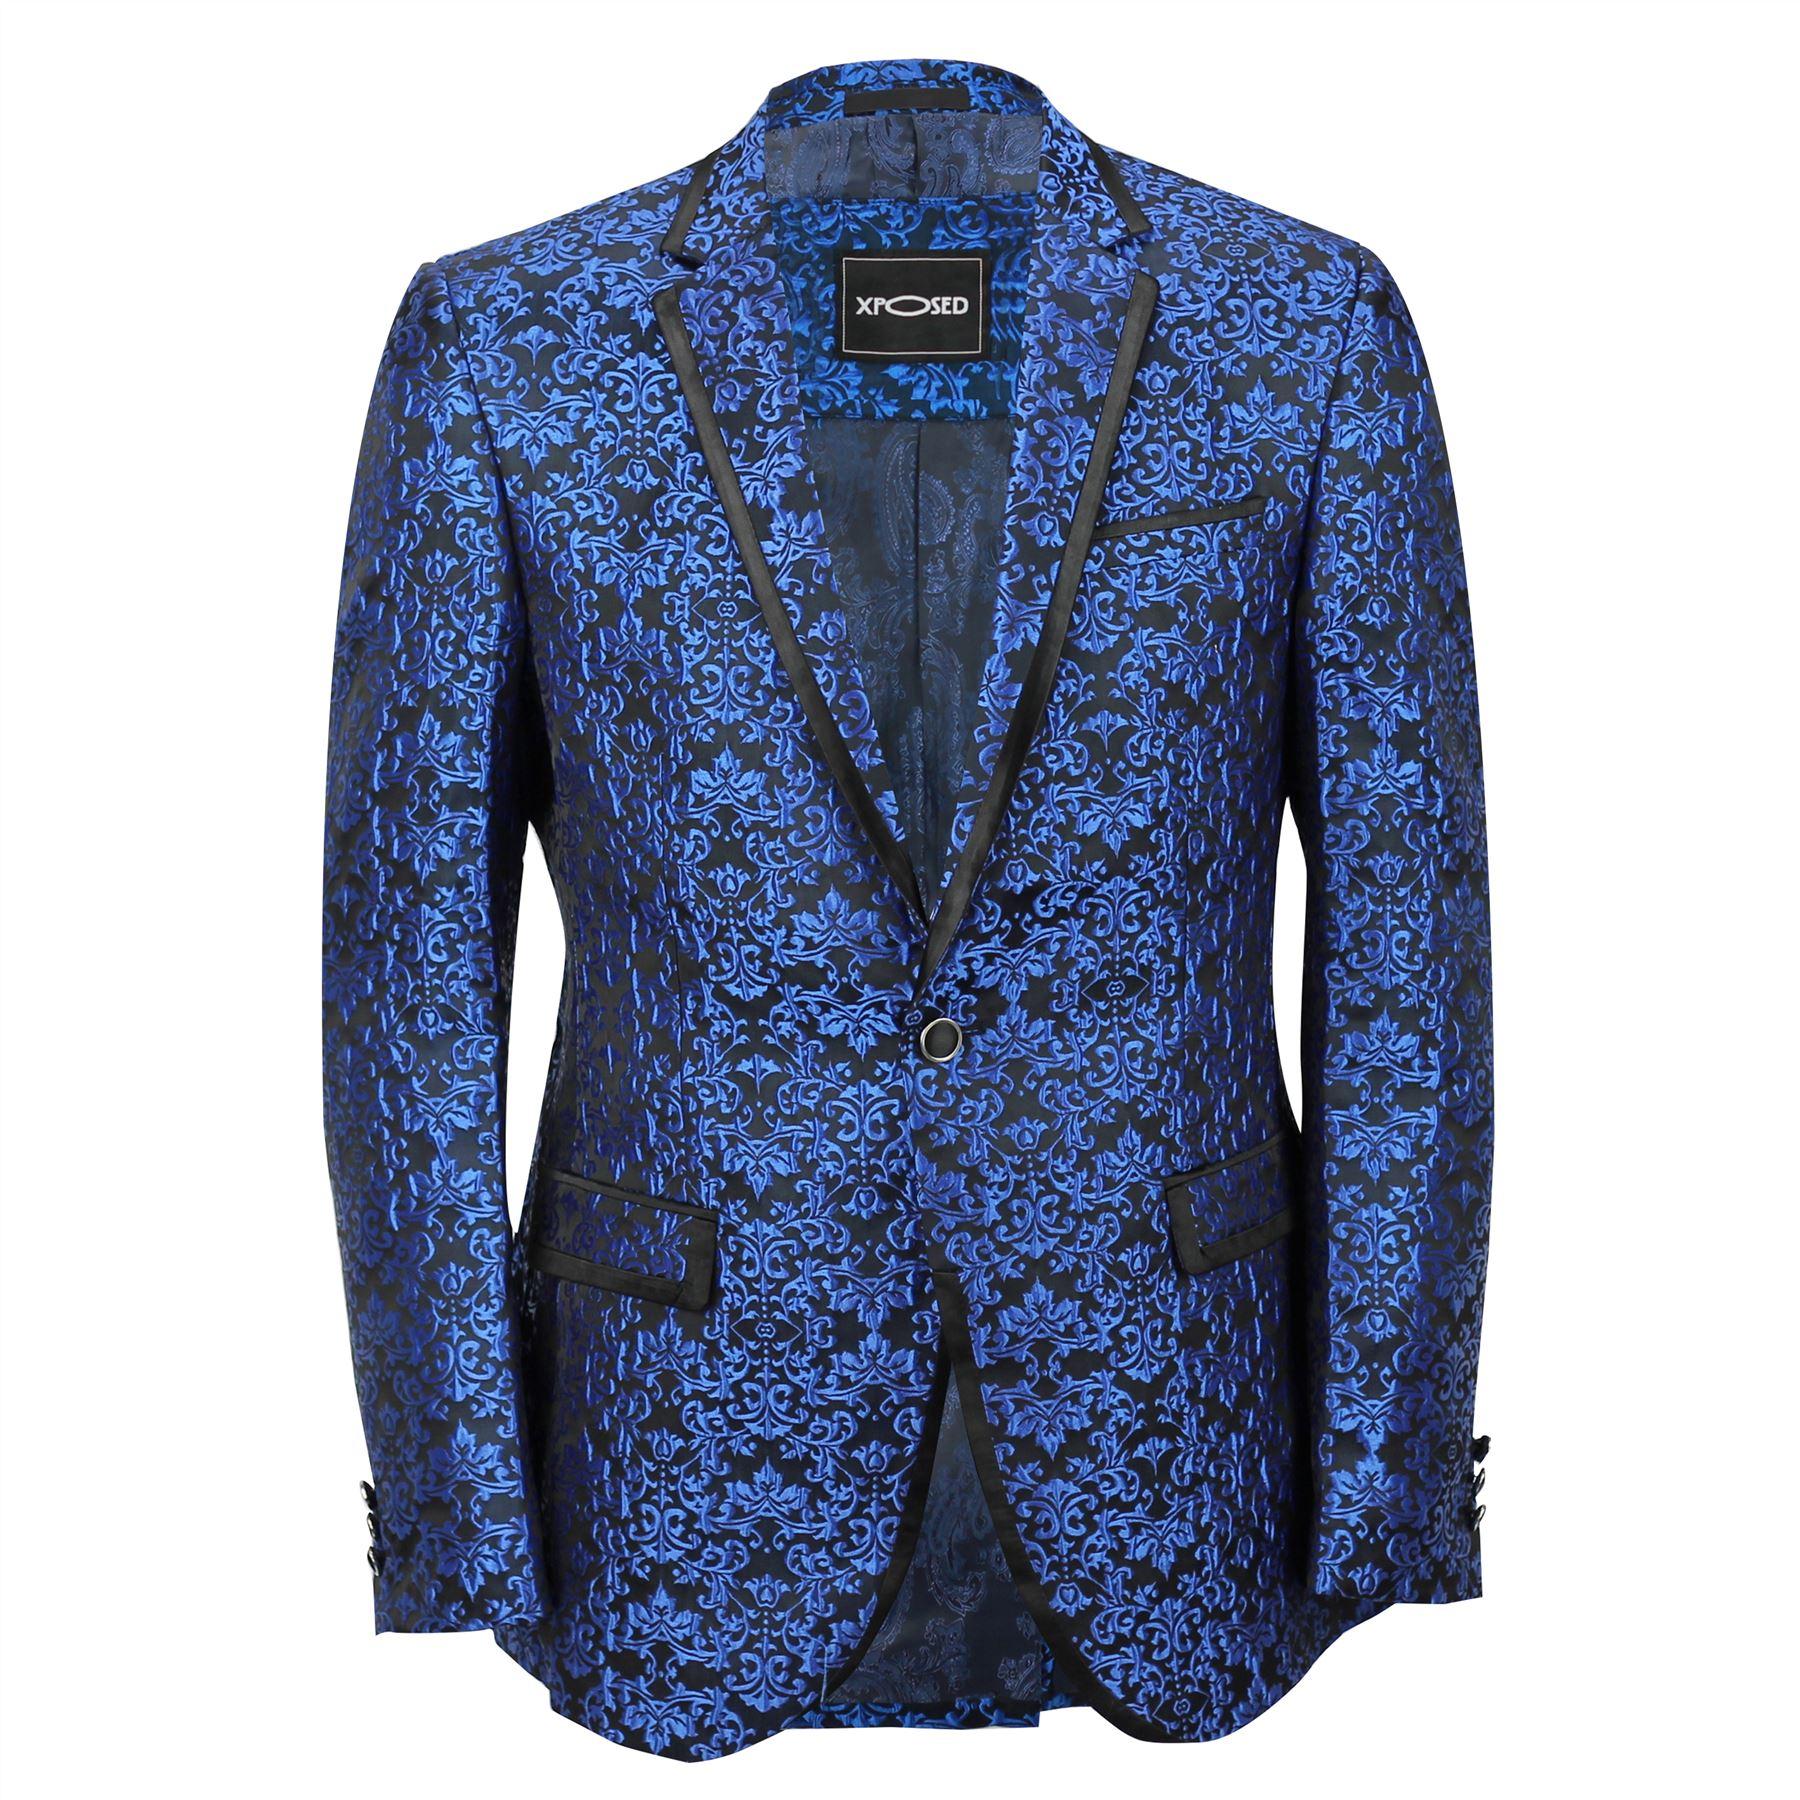 4951a6c96834 Mens Blue Paisley Print Italian Designer Style Suit Jacket Slim ...